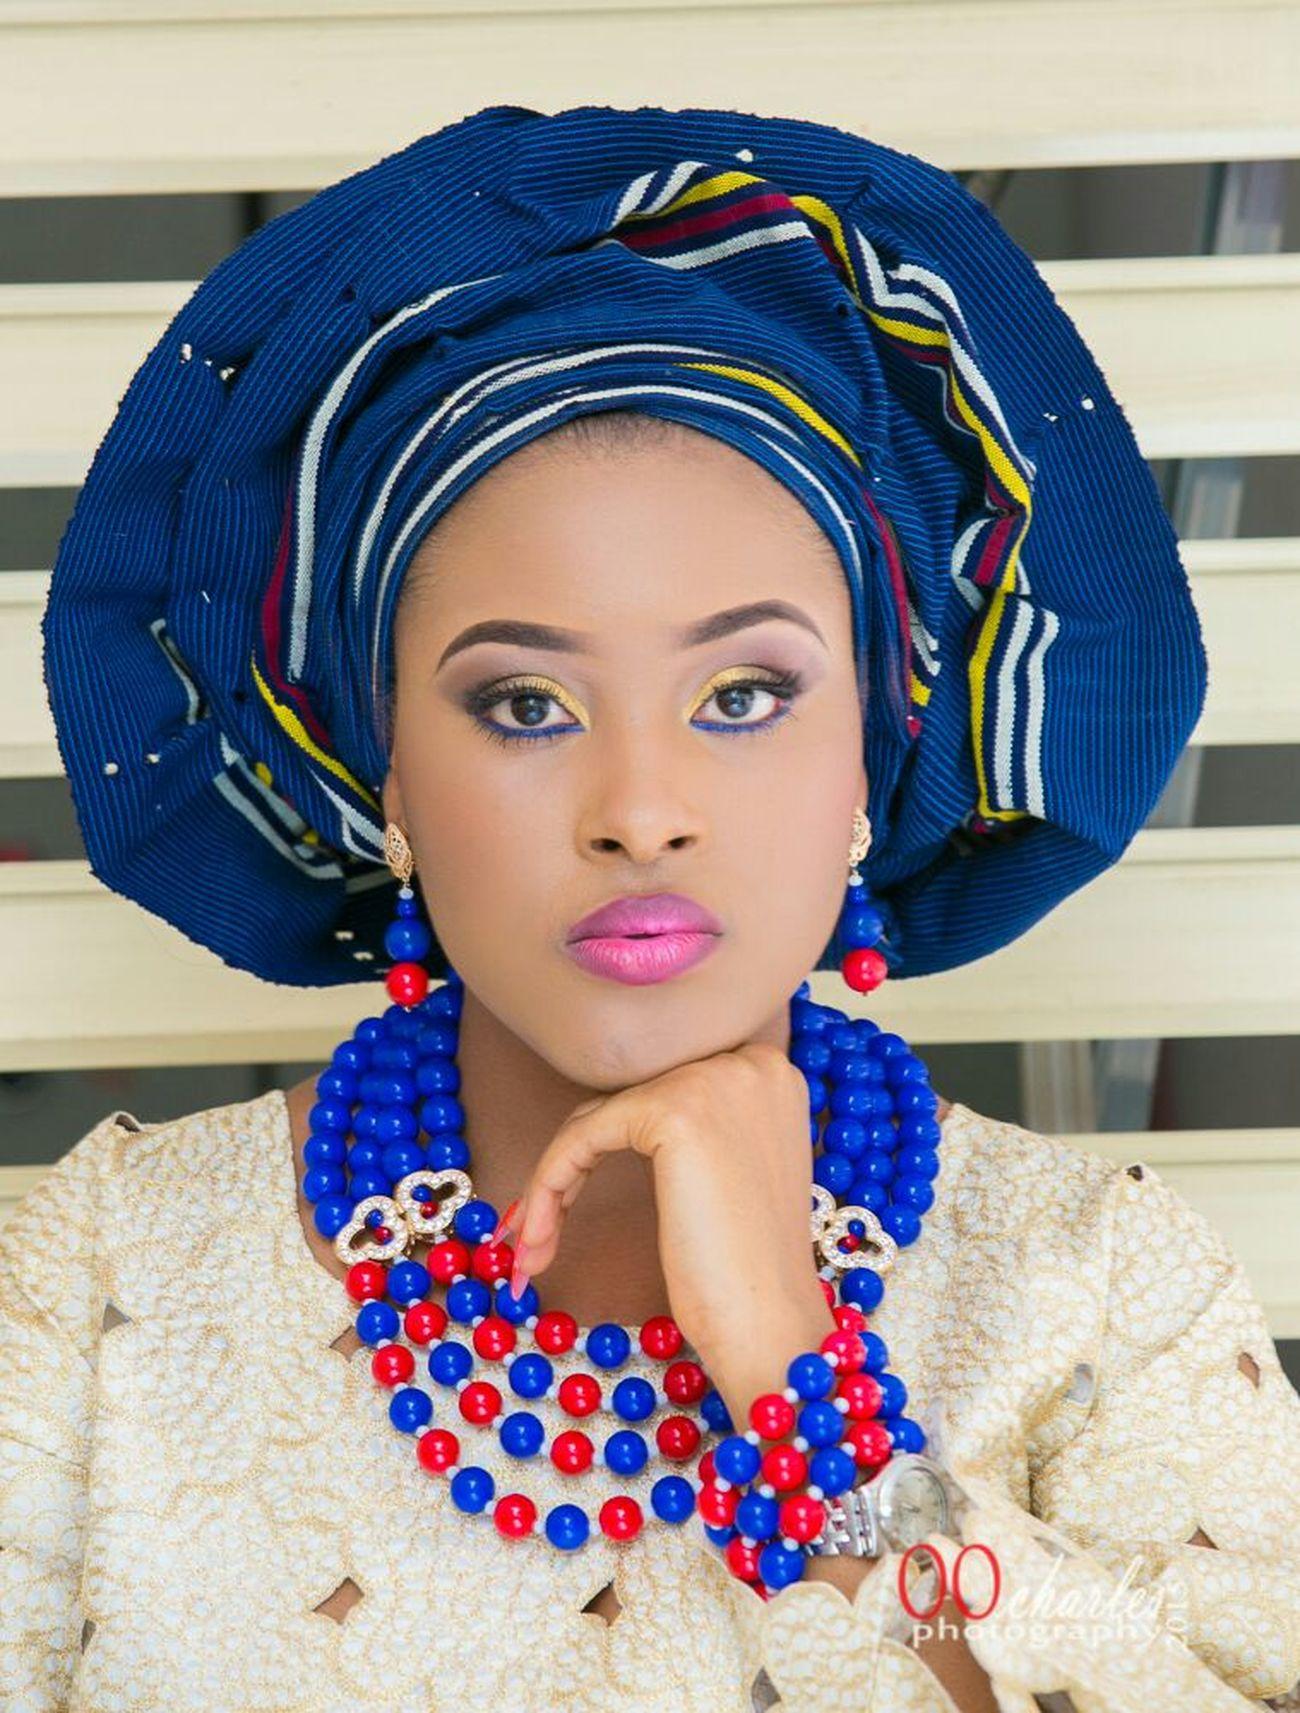 The Fashionist - 2015 EyeEm Awards the African bride